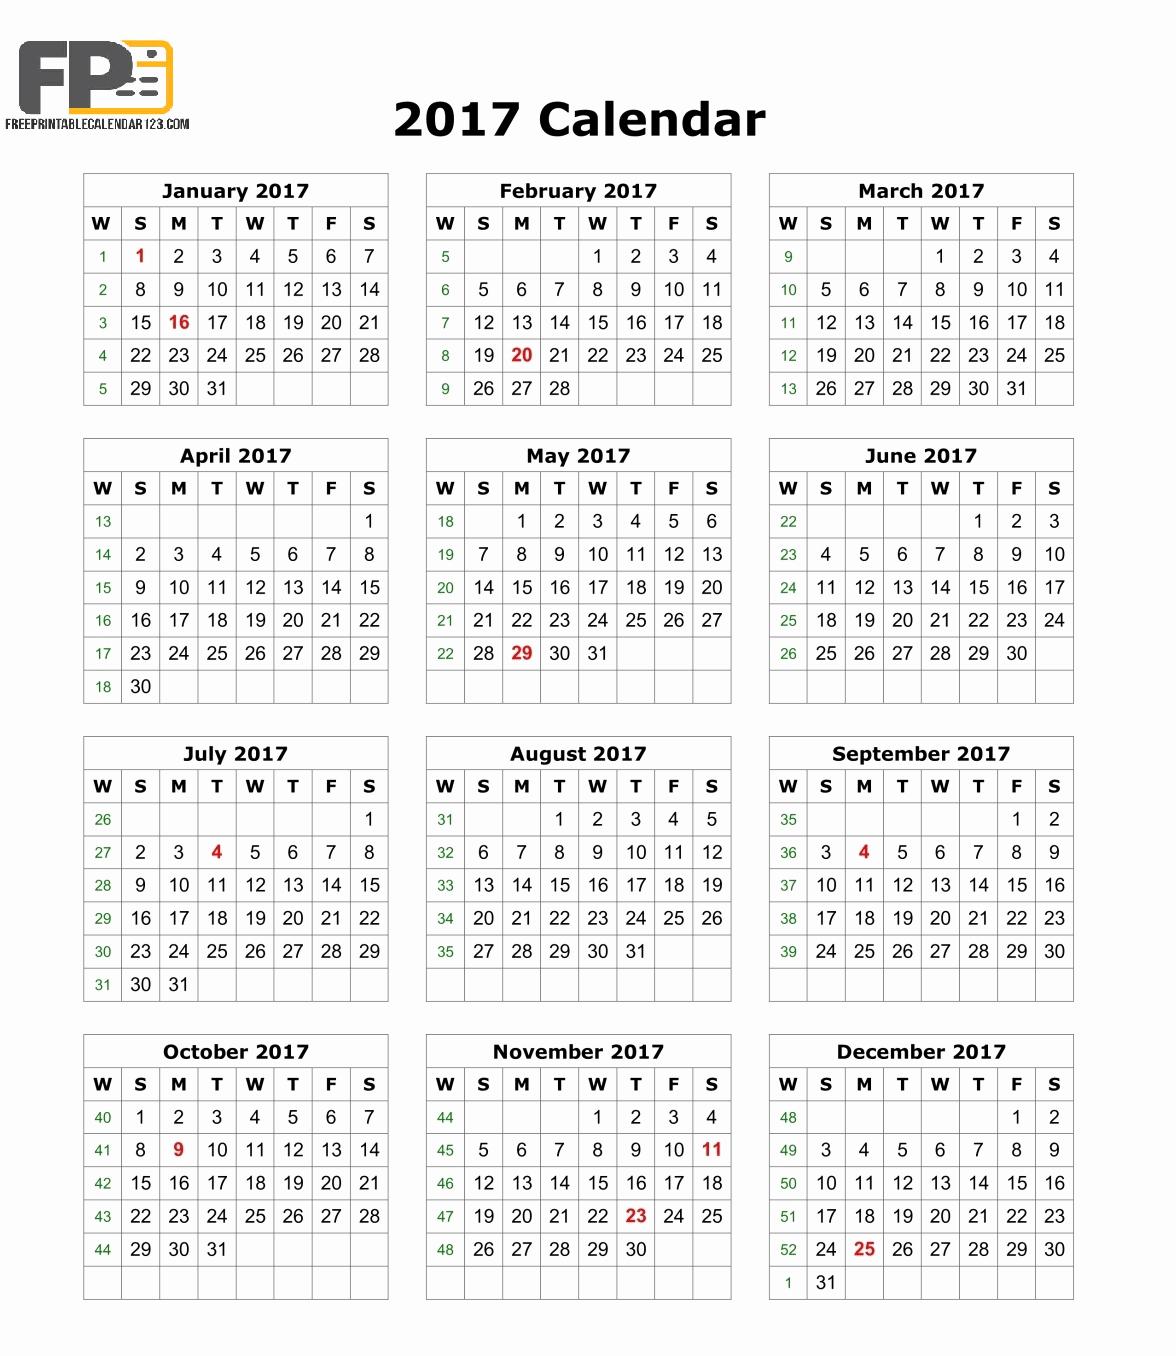 2017 Calendar Month by Month New August 2017 Calendar Pdf